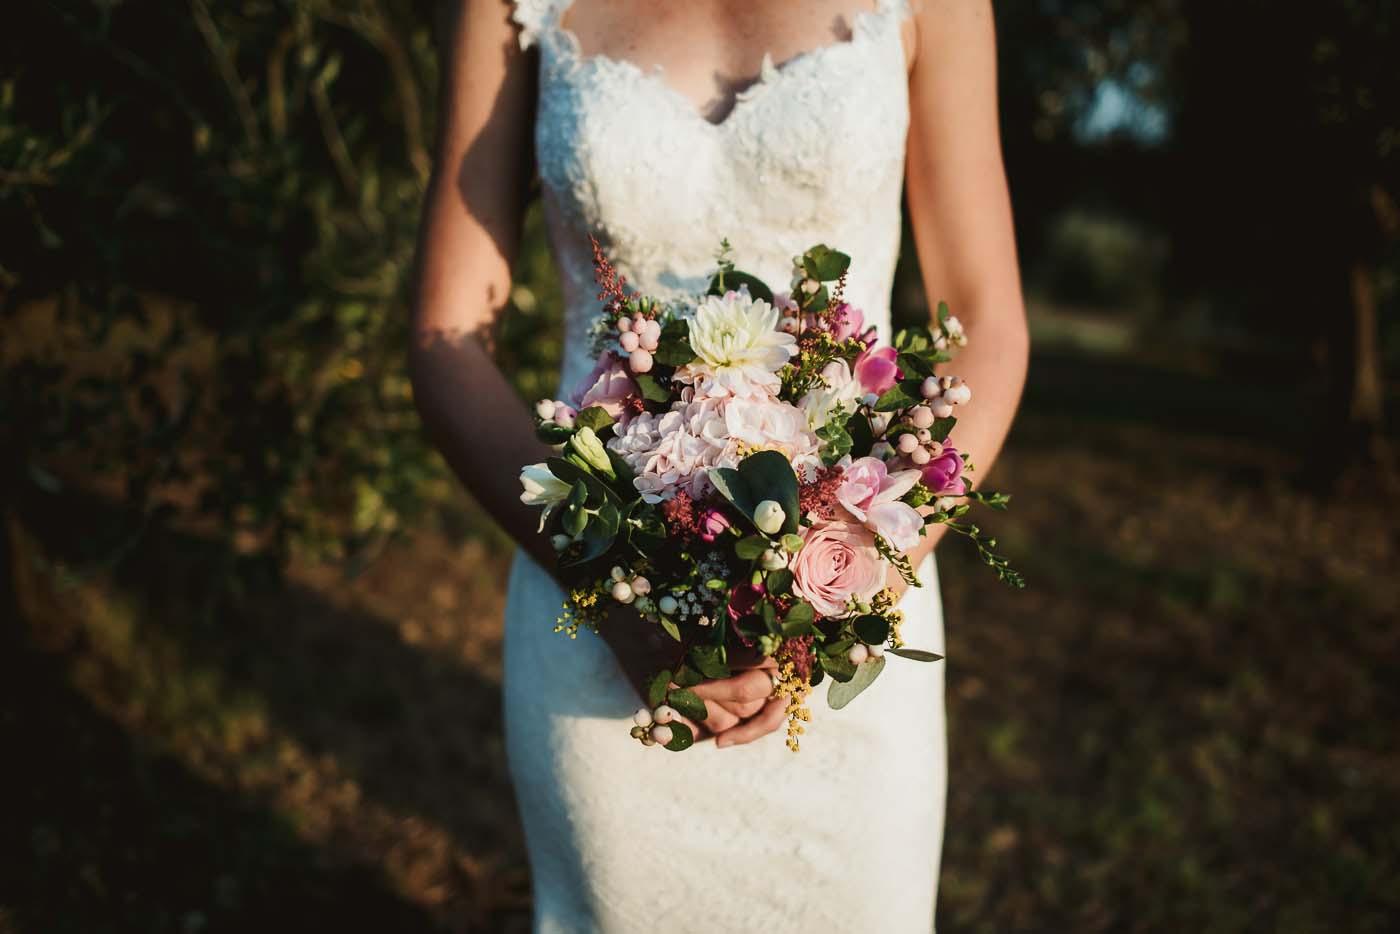 Relaxed-wedding-borgo-stomennano-1170